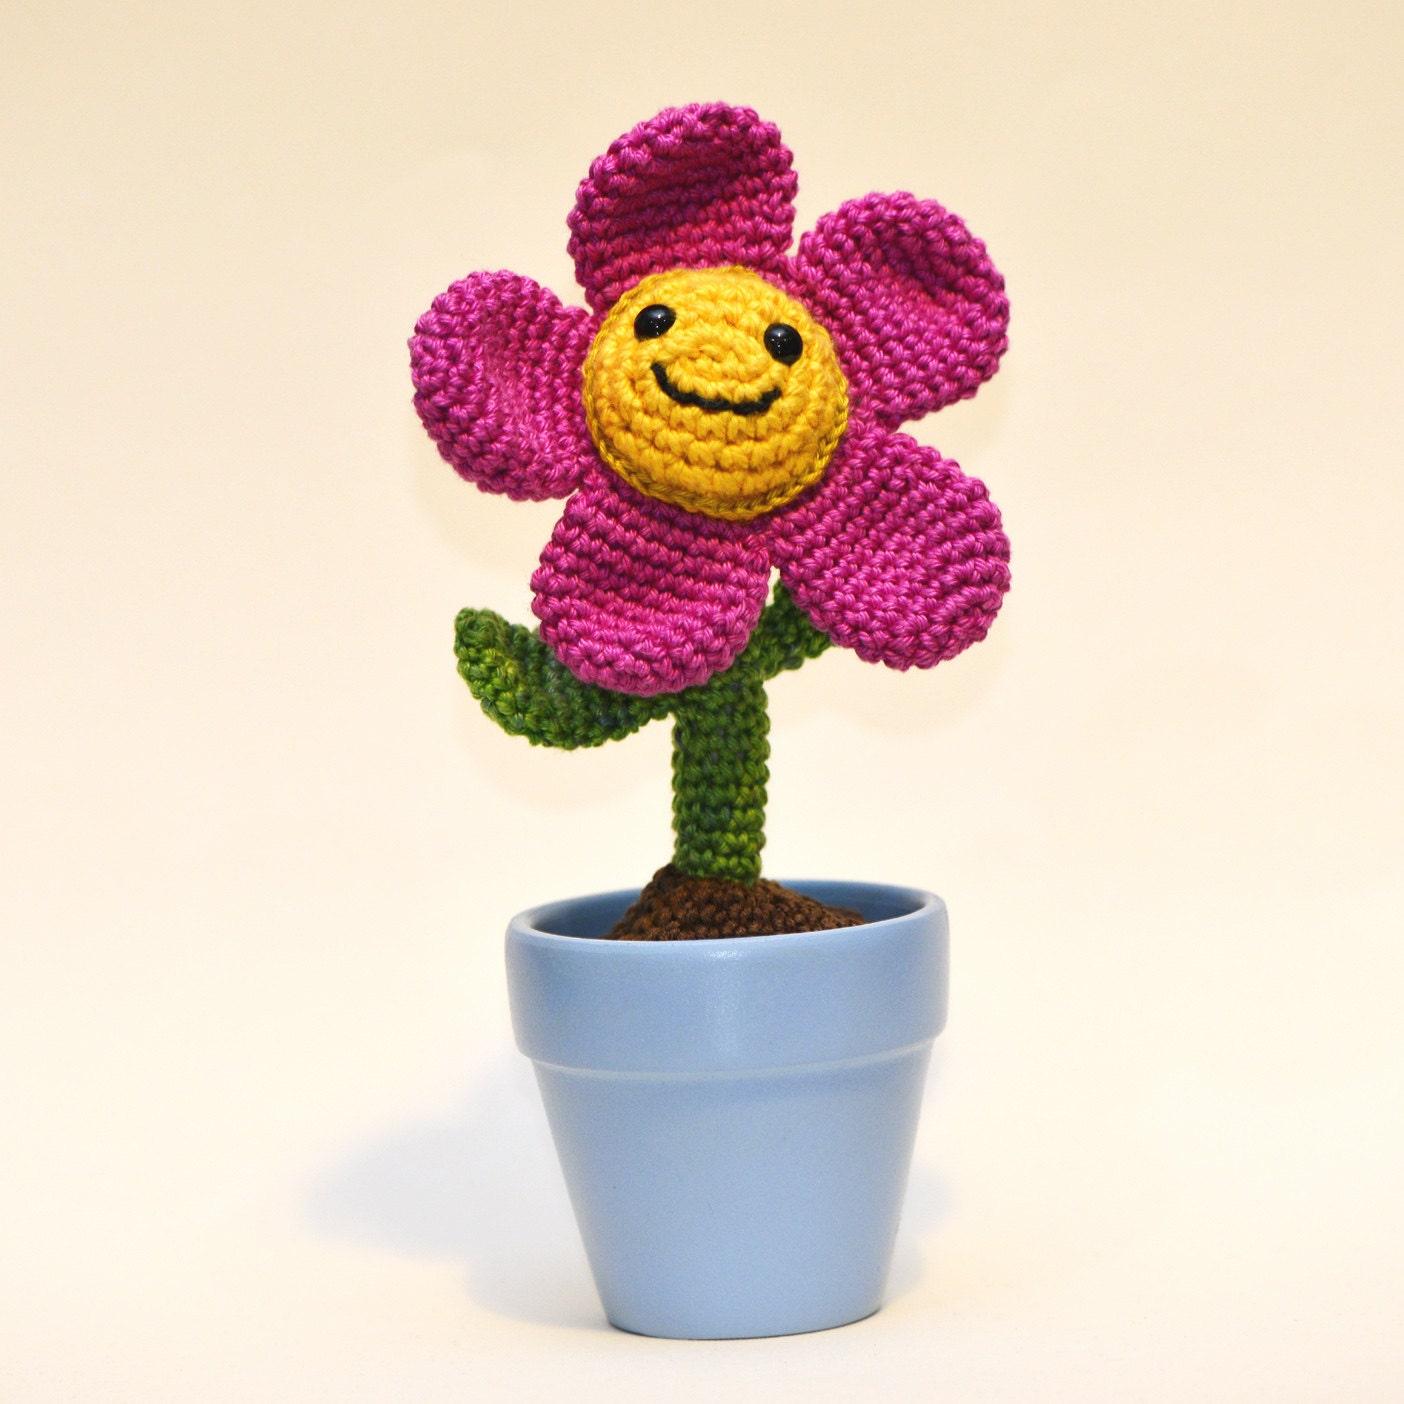 Amigurumi Flower Pot : Crochet potted flower amigurumi Tulip plant by MsToosh on Etsy